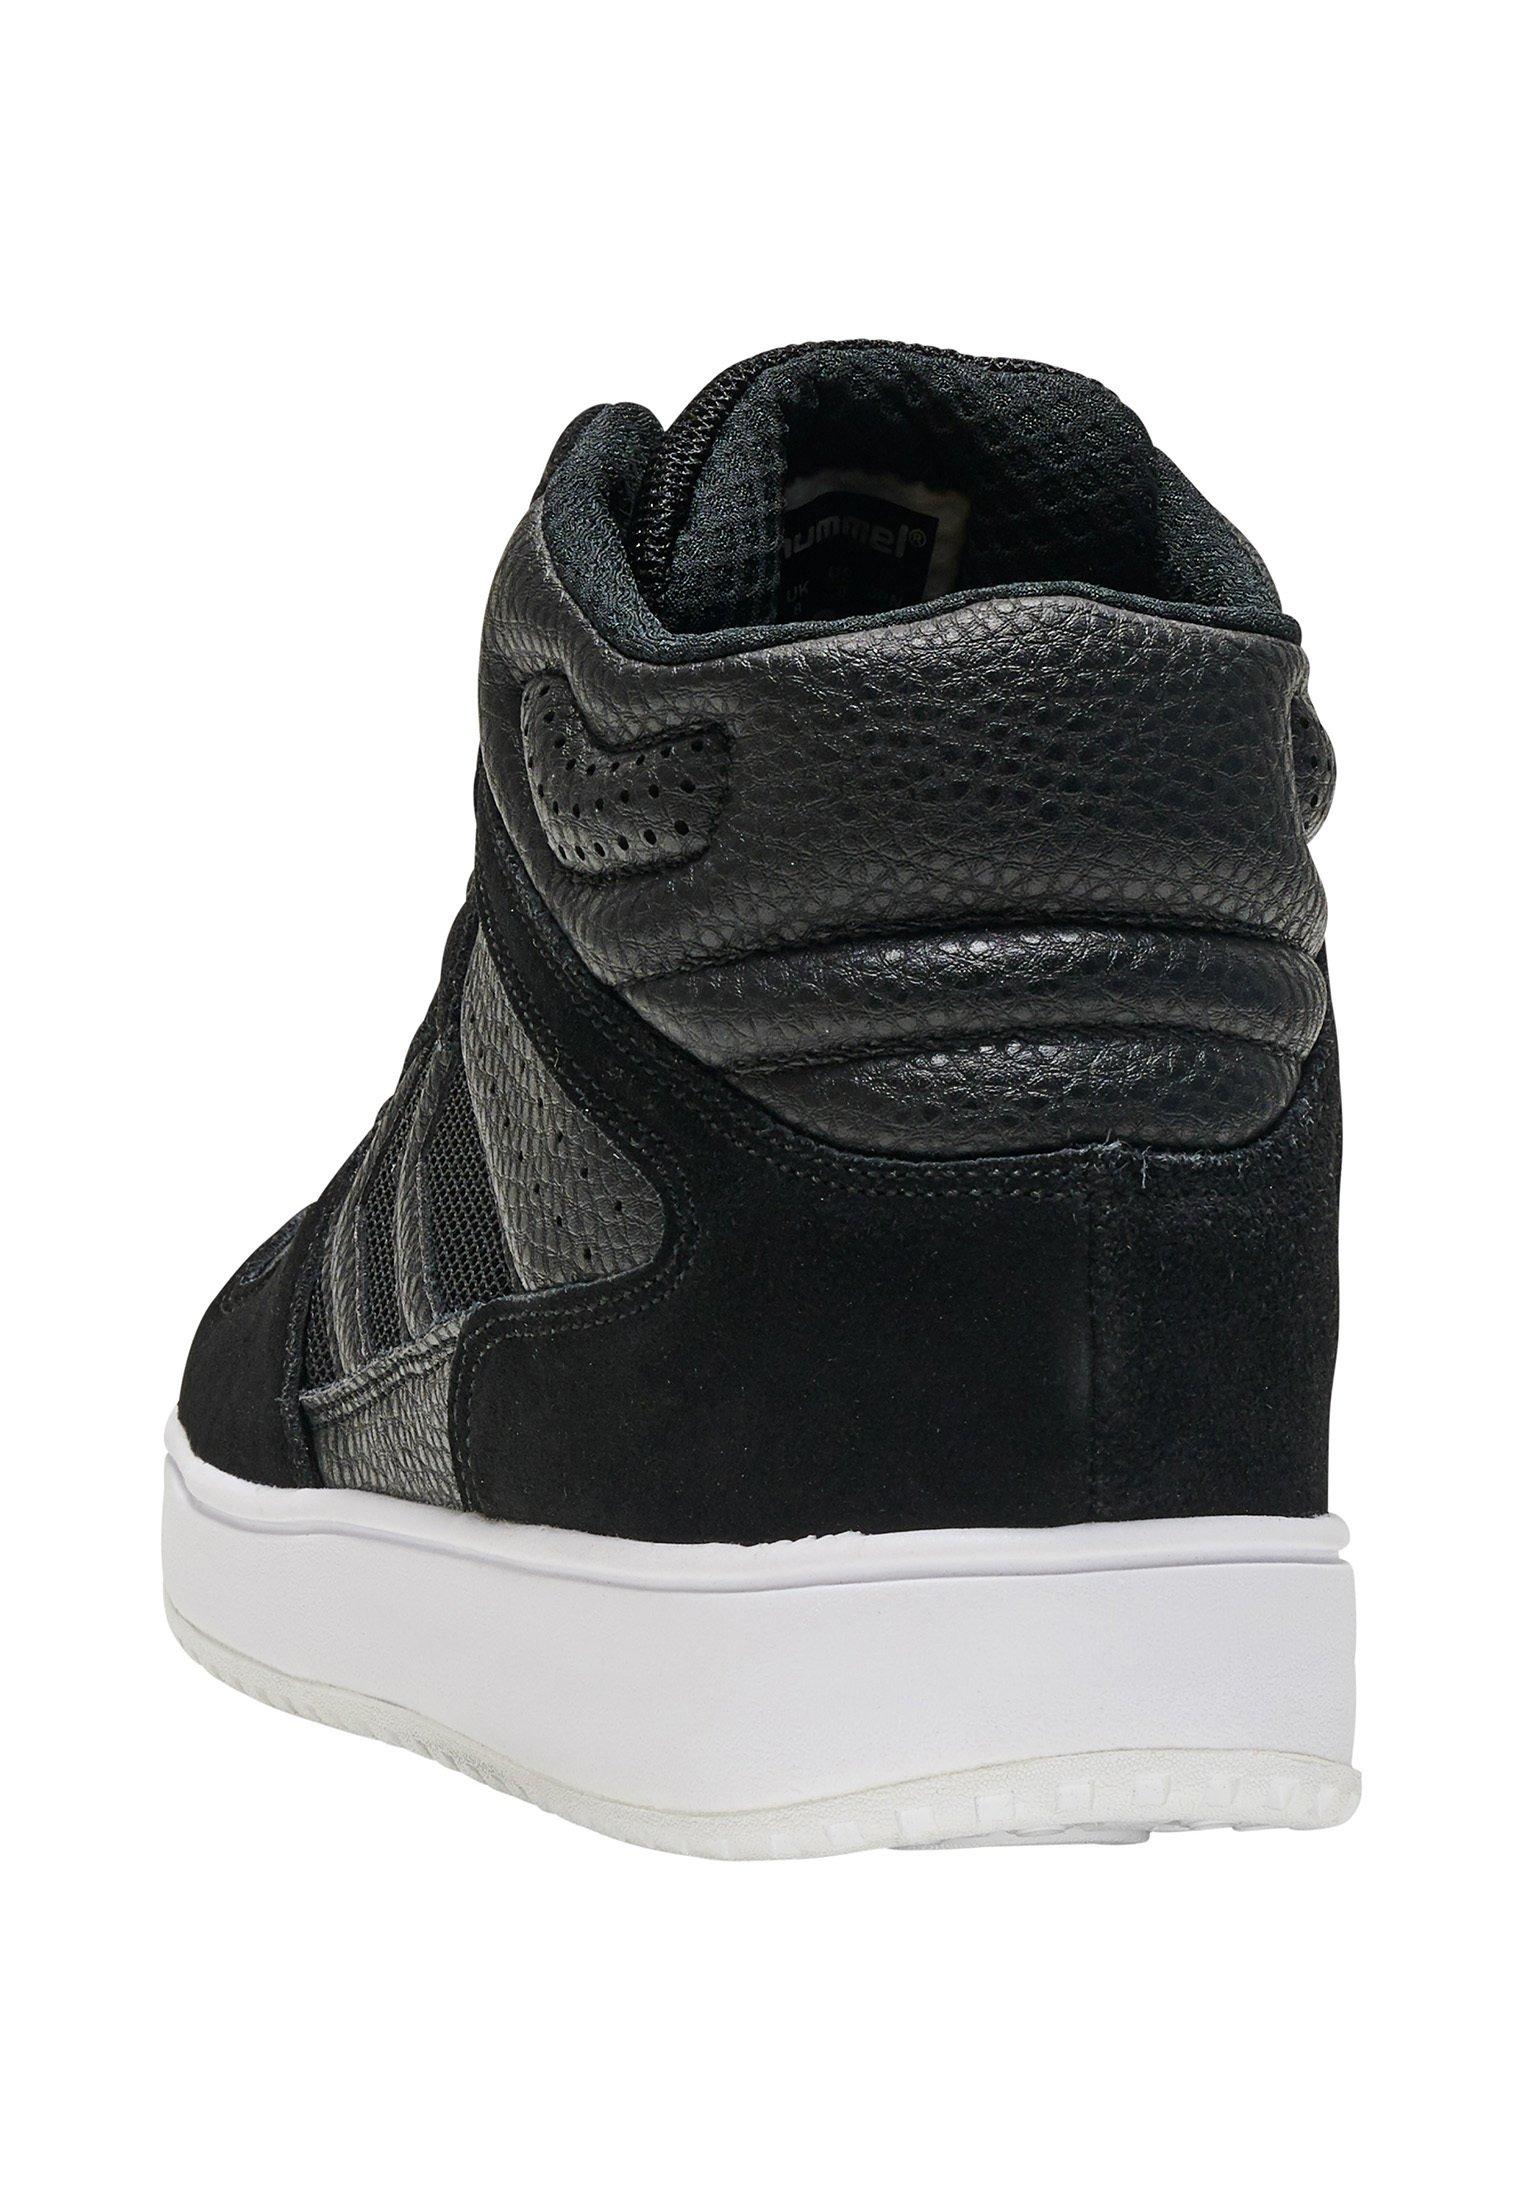 Hummel ST POWER PLAY MID - Sneaker high - black/schwarz - Herrenschuhe FbWQQ